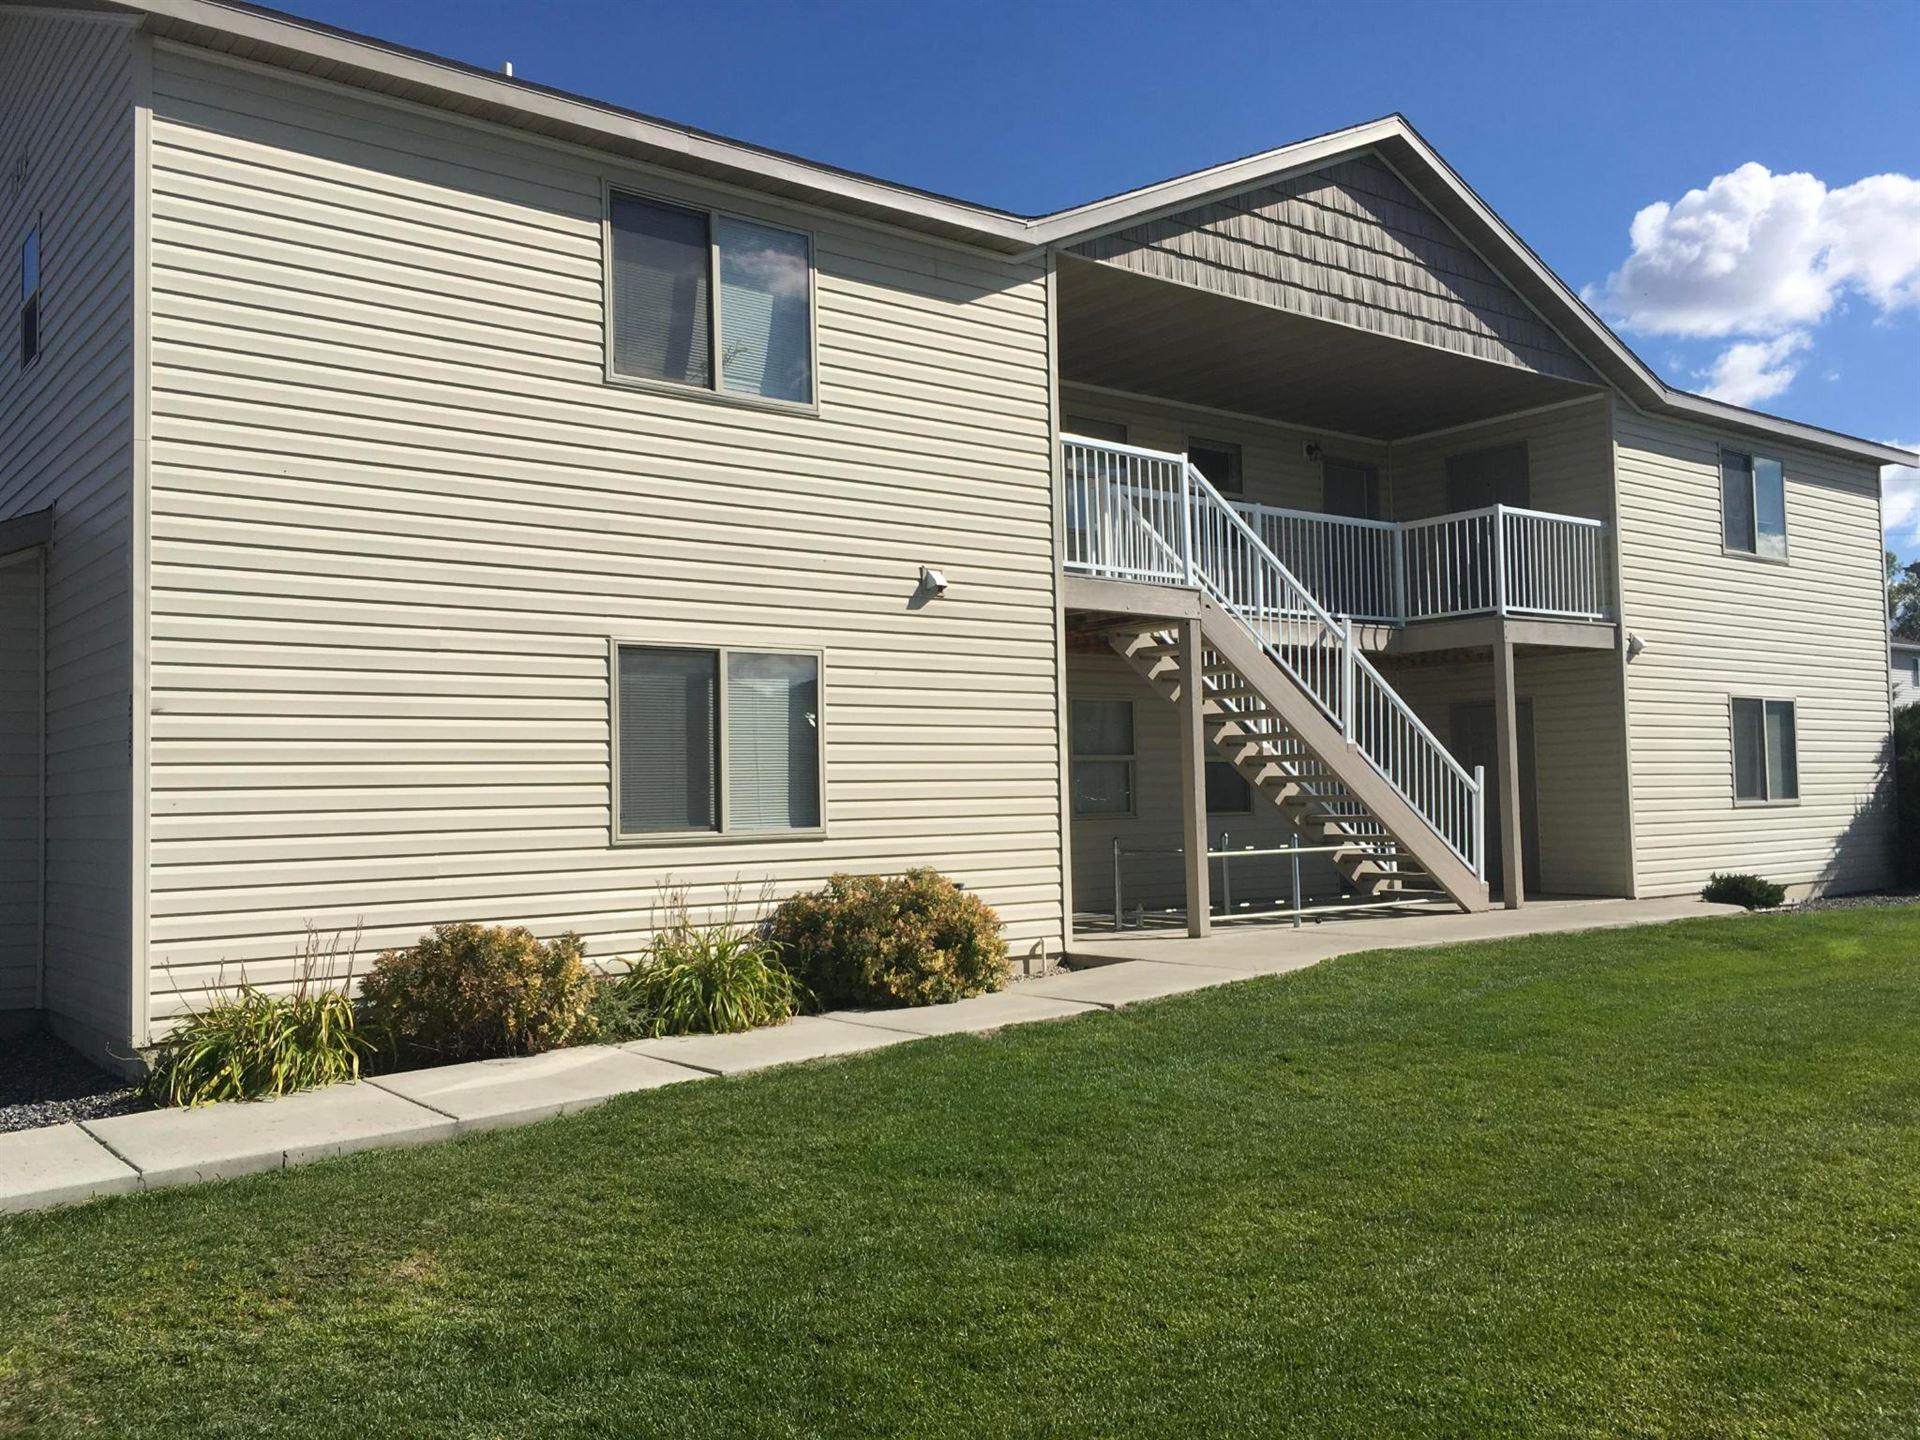 Photo of 3791 Beechnut Street, East Helena, MT 59635 (MLS # 22100518)